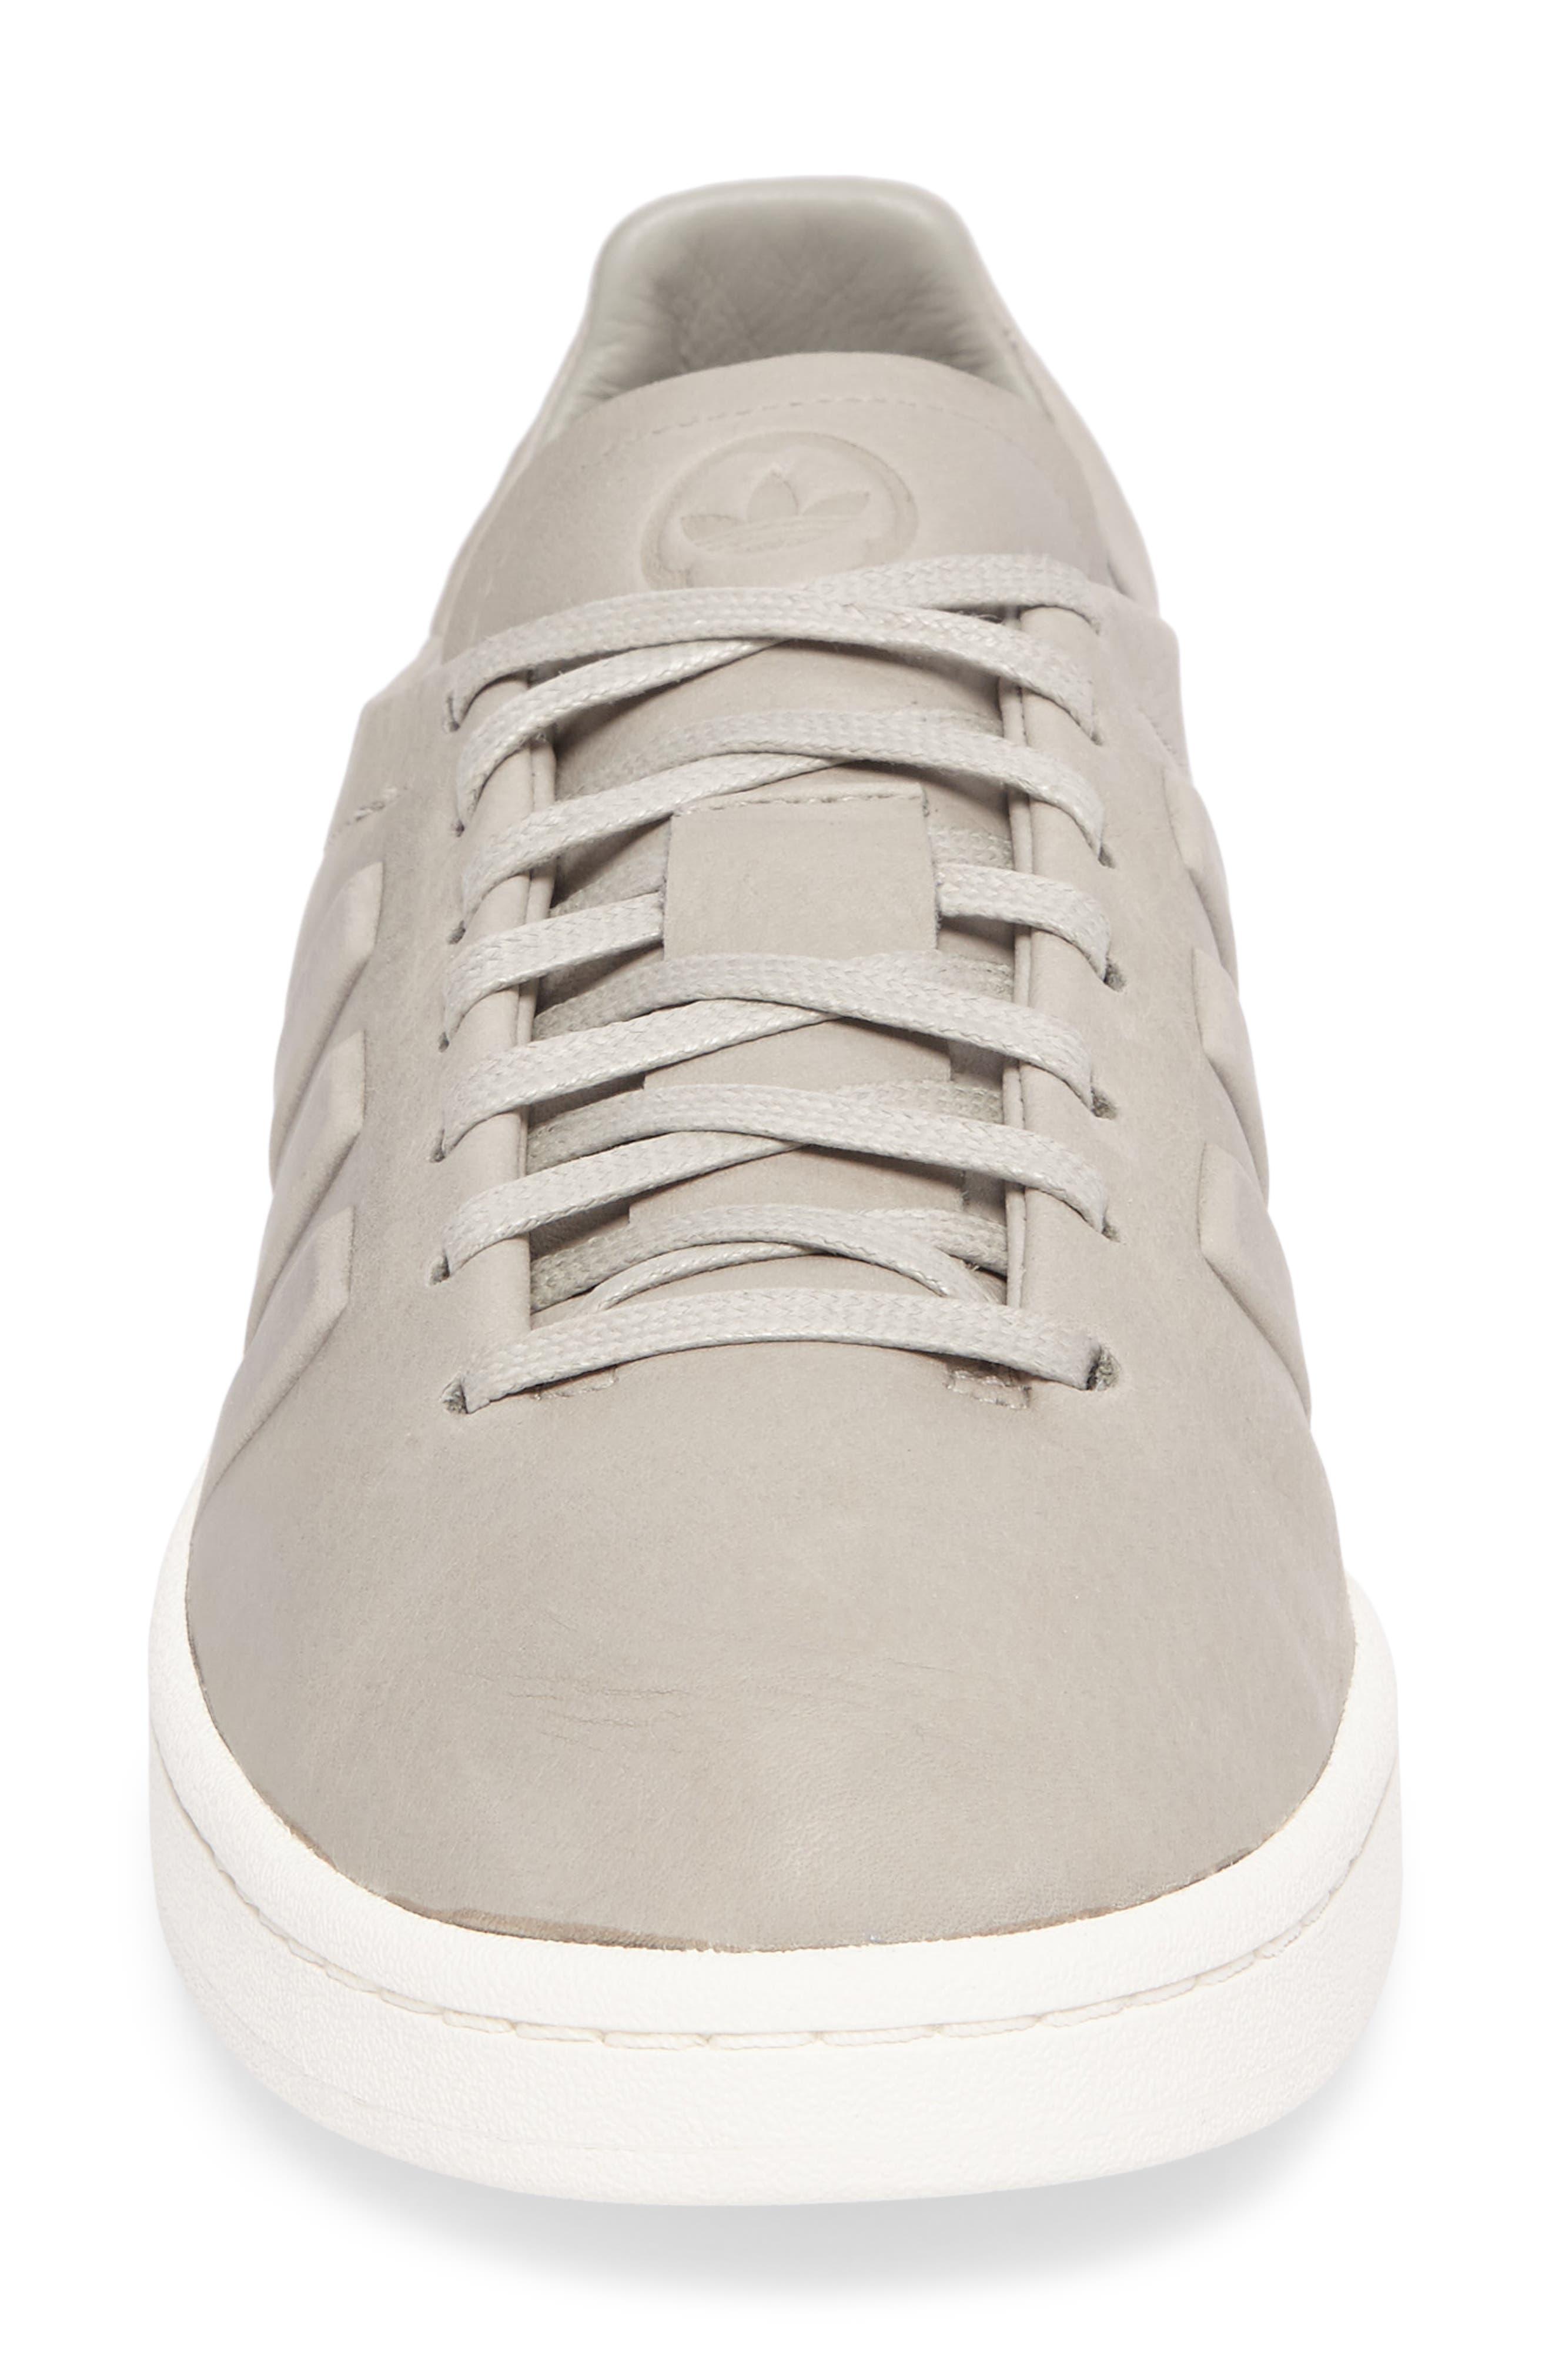 Low Top Sneaker,                             Alternate thumbnail 4, color,                             Sesame/ Chalk White